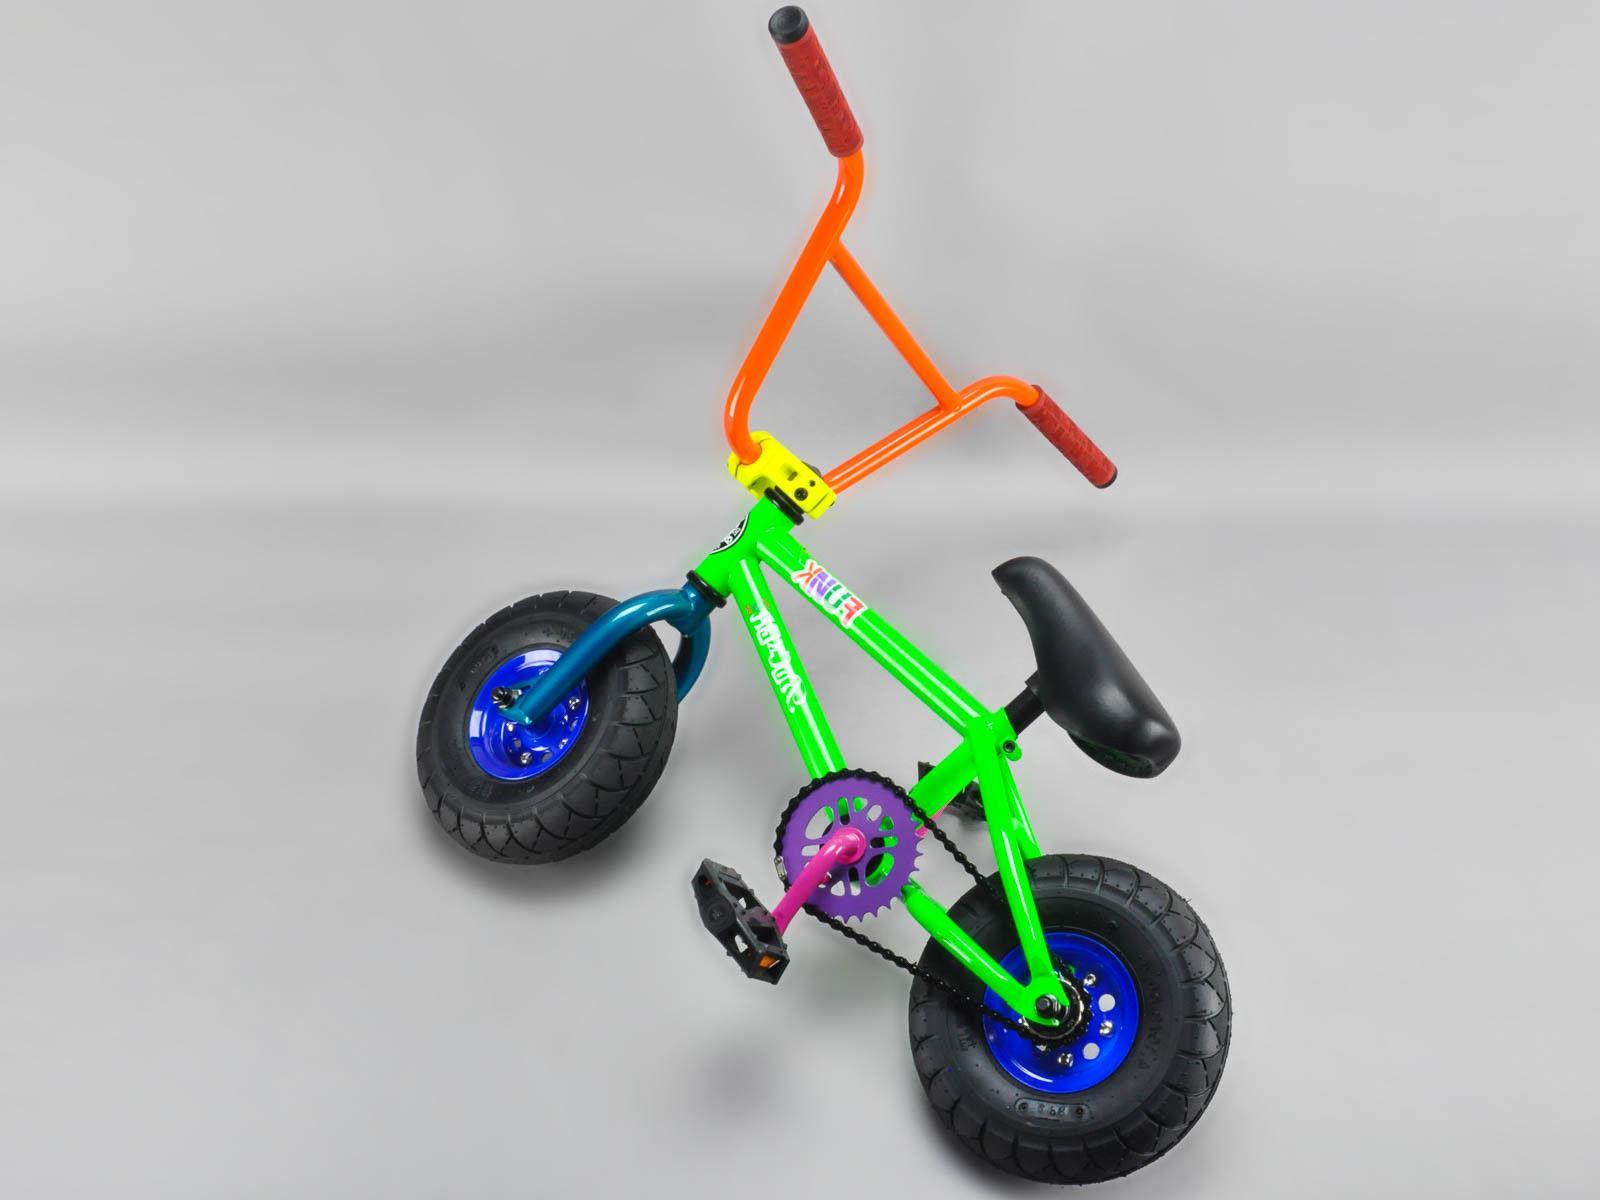 *GENUINE - FUNK iROK+ BMX BMX Bike